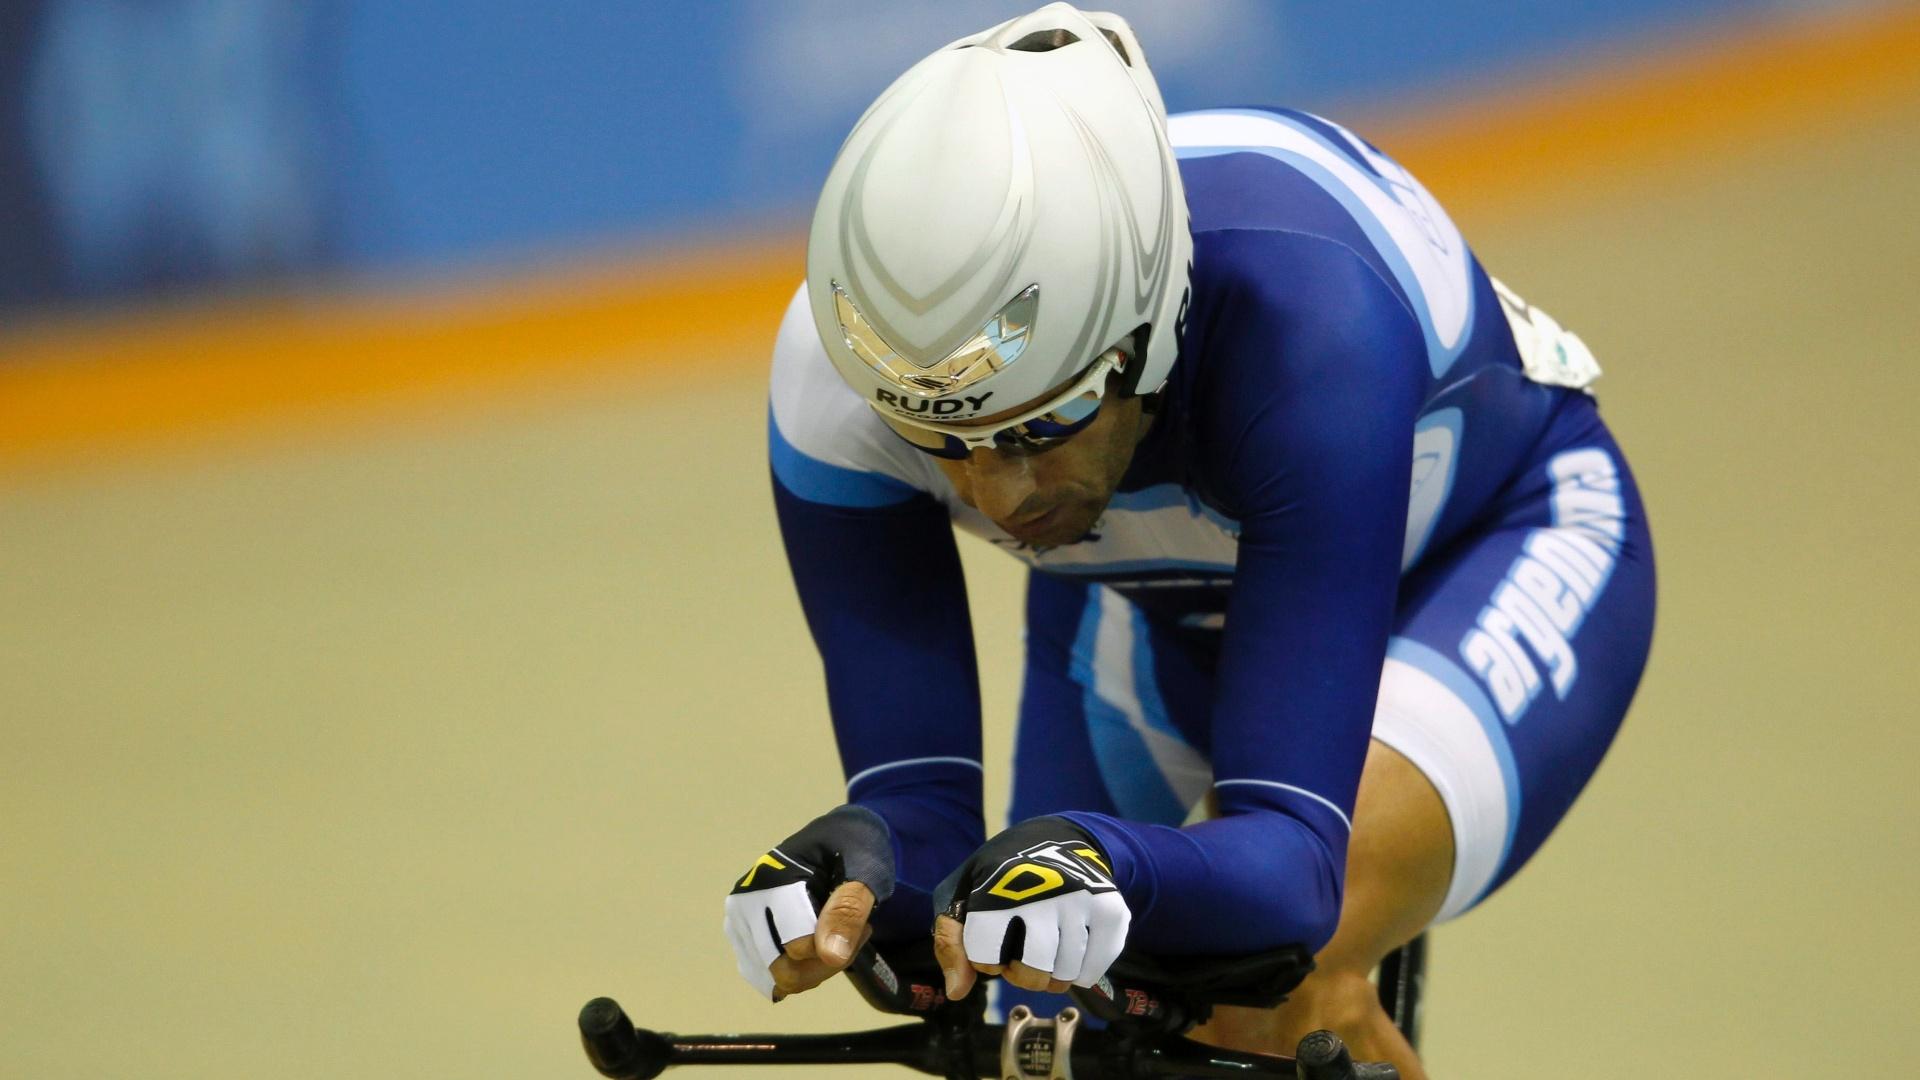 Walter Perez, ciclista da Argentina, compete nos Jogos Pan-Americanos de Guadalajara